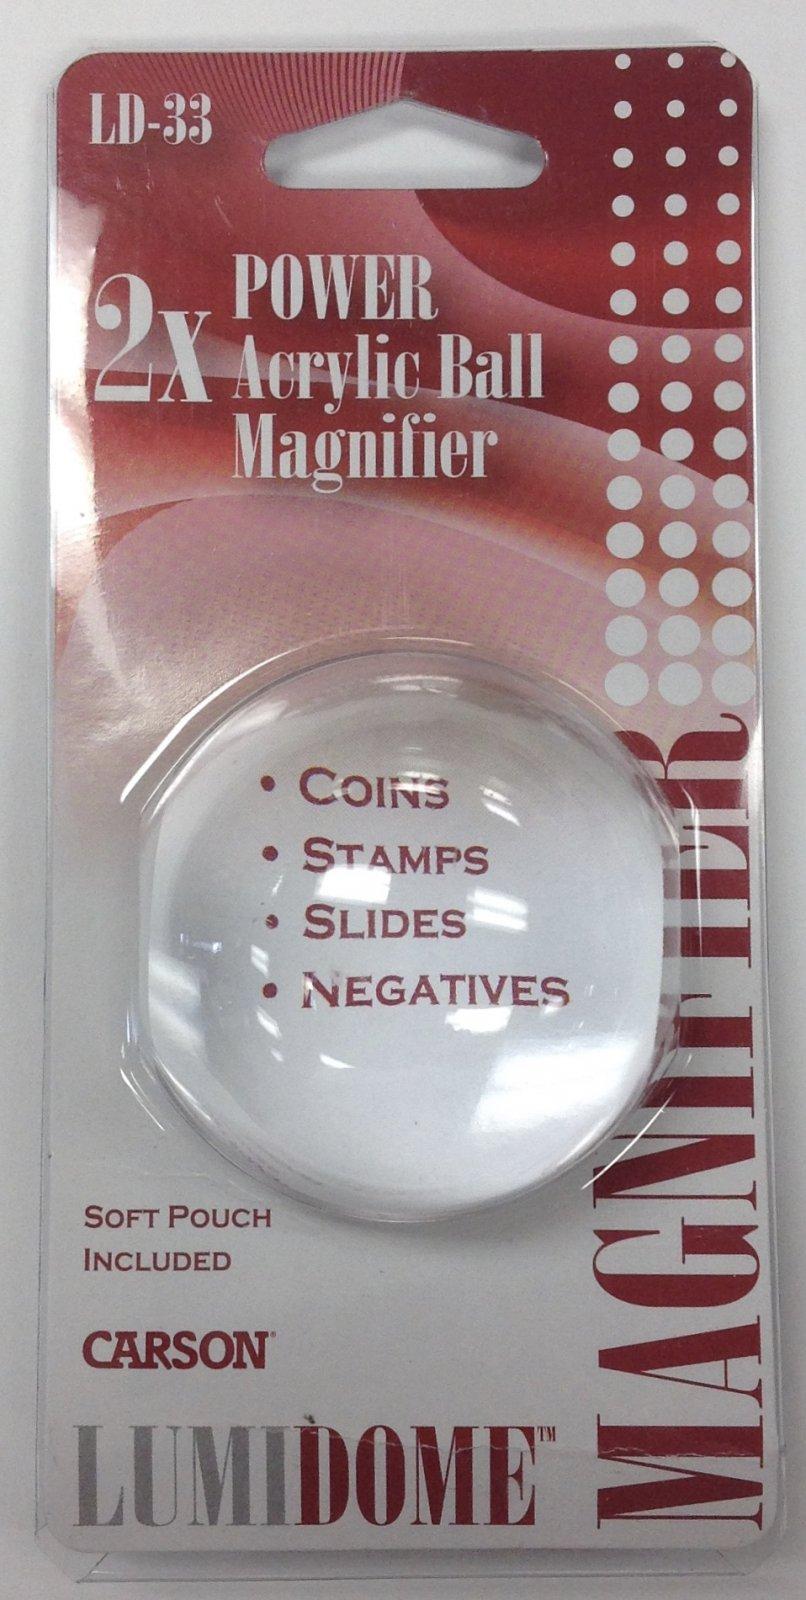 lumidome ball magnifier